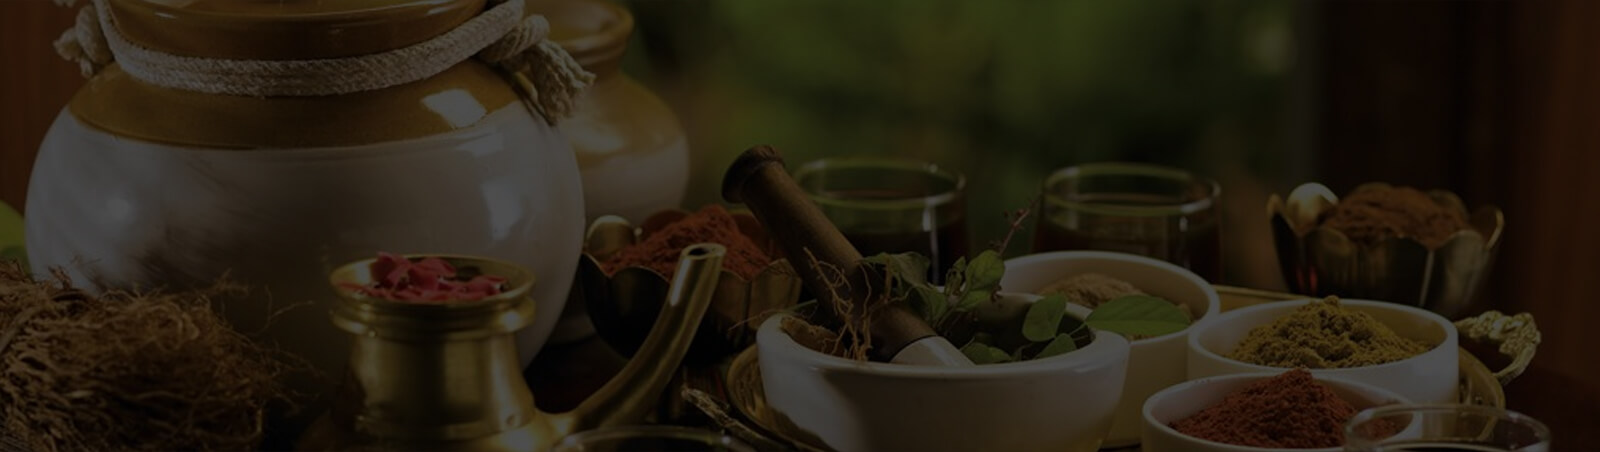 11 Top Kerala Ayurvedic Massages & Benefits | Greens Ayurveda